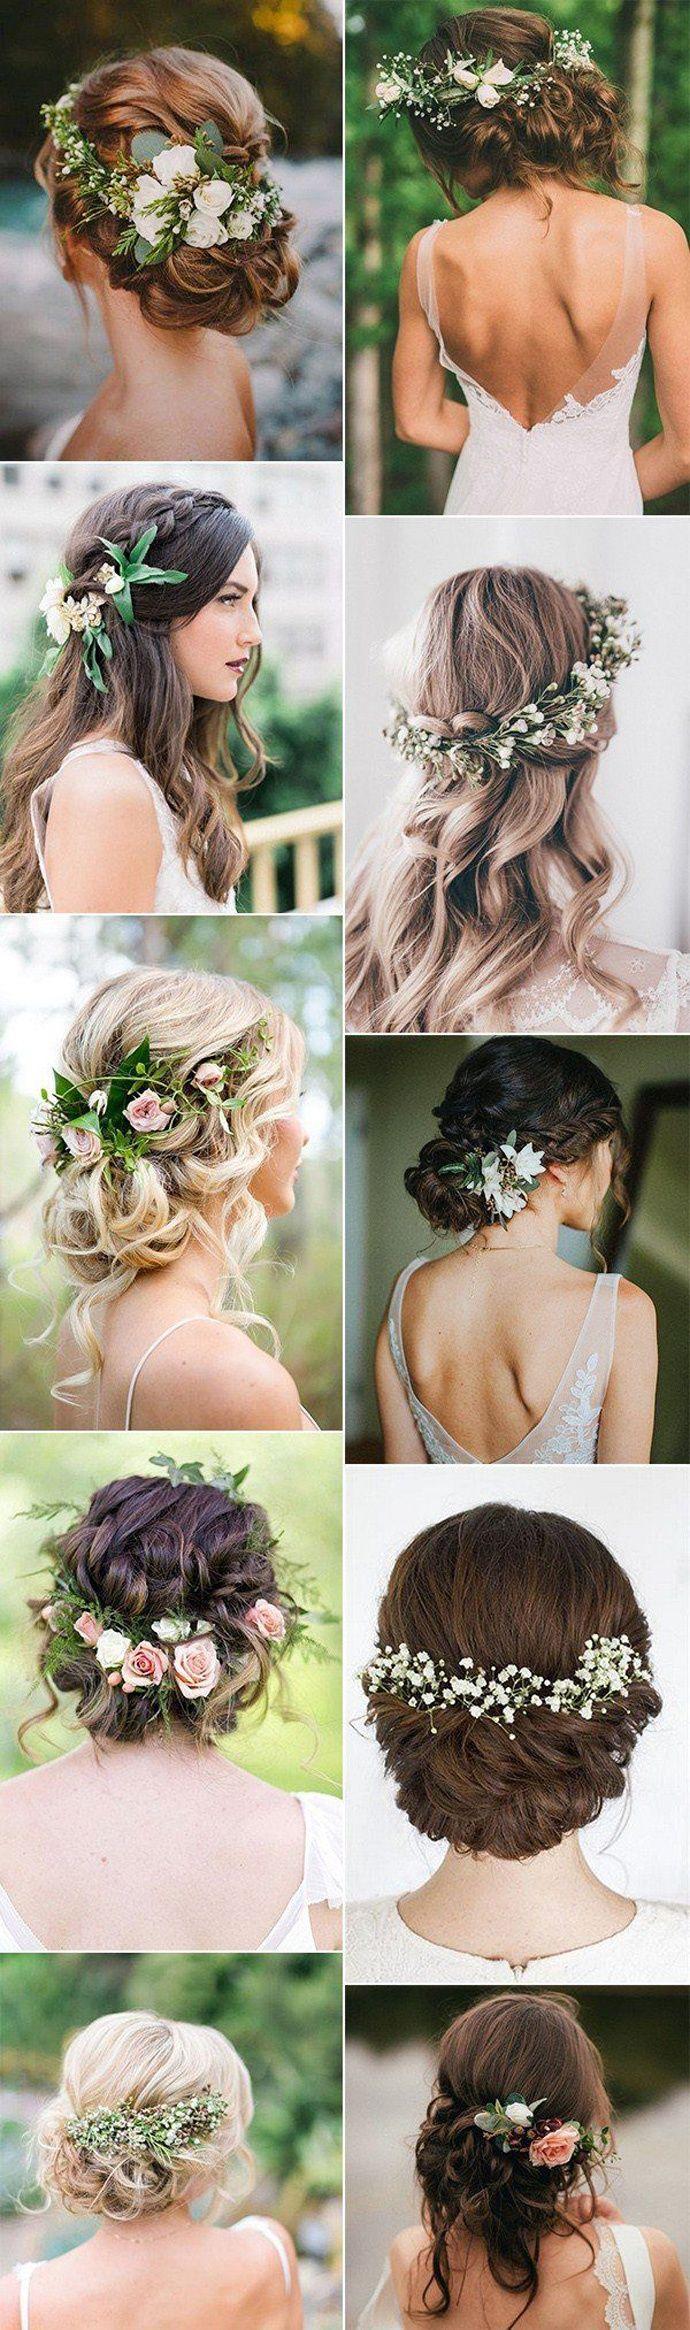 Fryzury Slubne Ozdobione Kwiatami Wedding Hair Flowers Beach Wedding Hair Romantic Beach Wedding